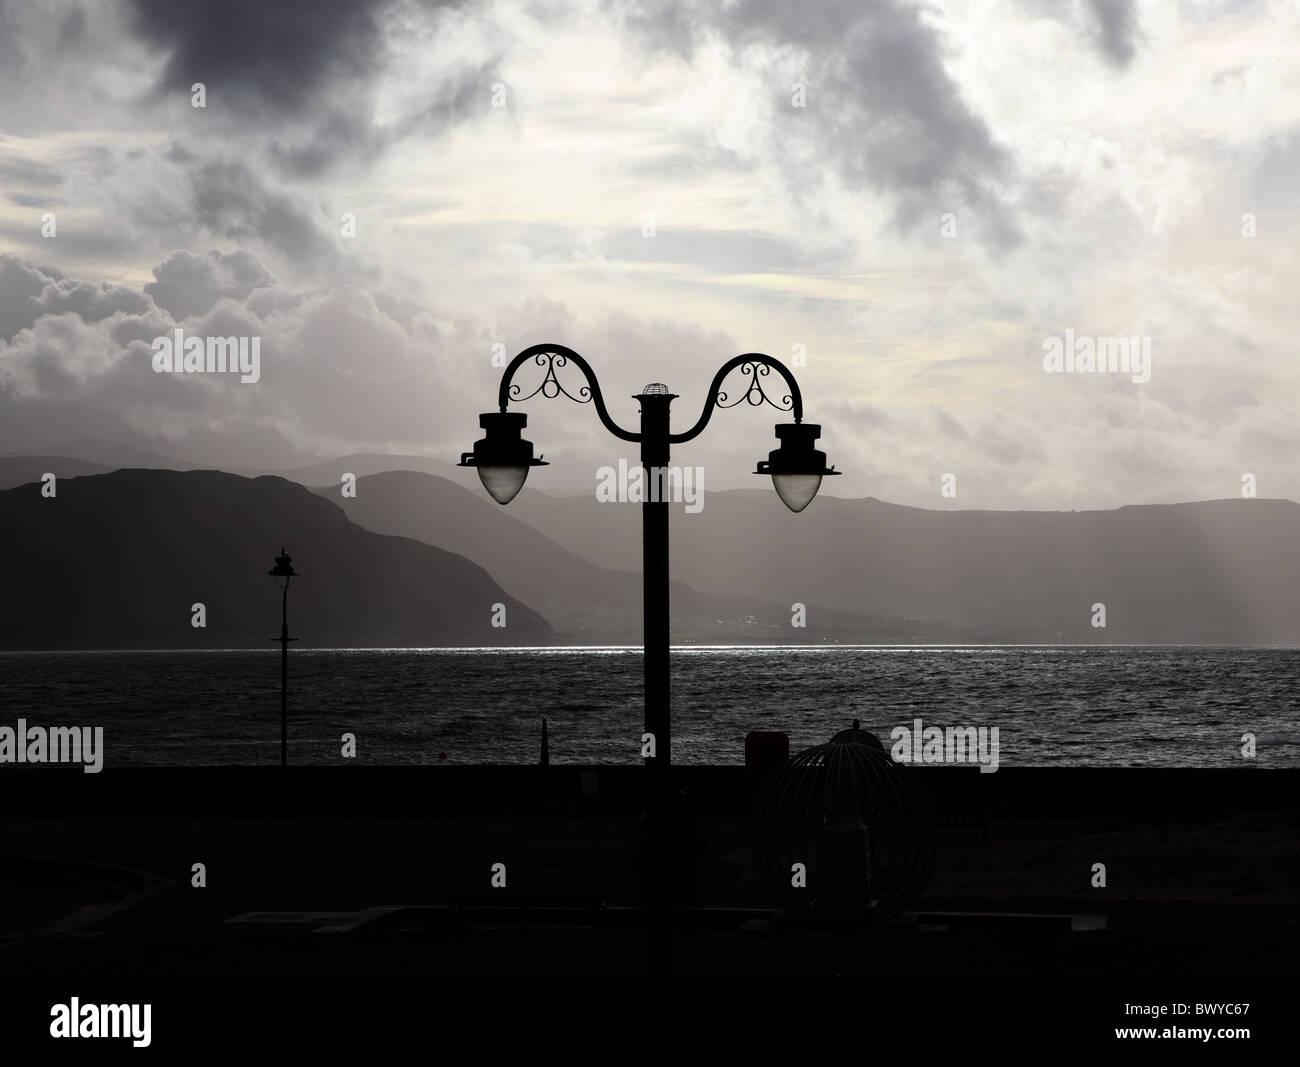 moody-view-llandudno-west-shore-overlooking-conwy-bay-north-wales-BWYC67.jpg